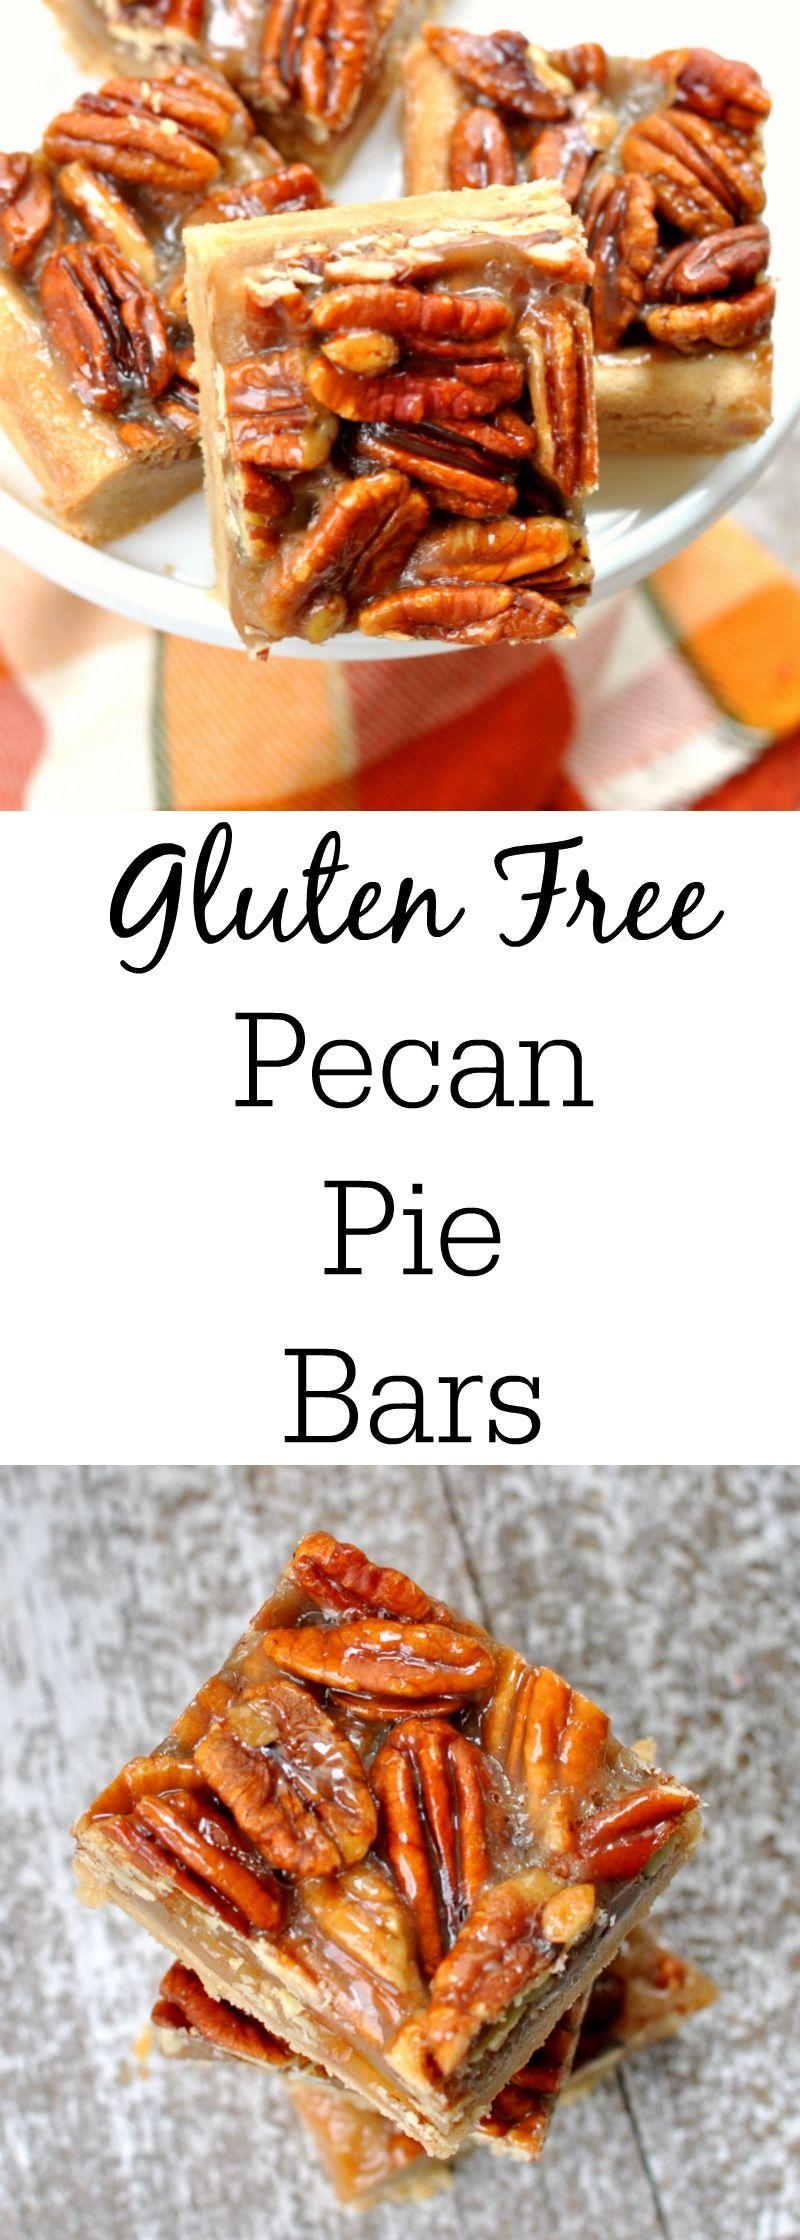 Gluten Free Pecan Pie Bars - The Best Pecan Pie Recipe Around!